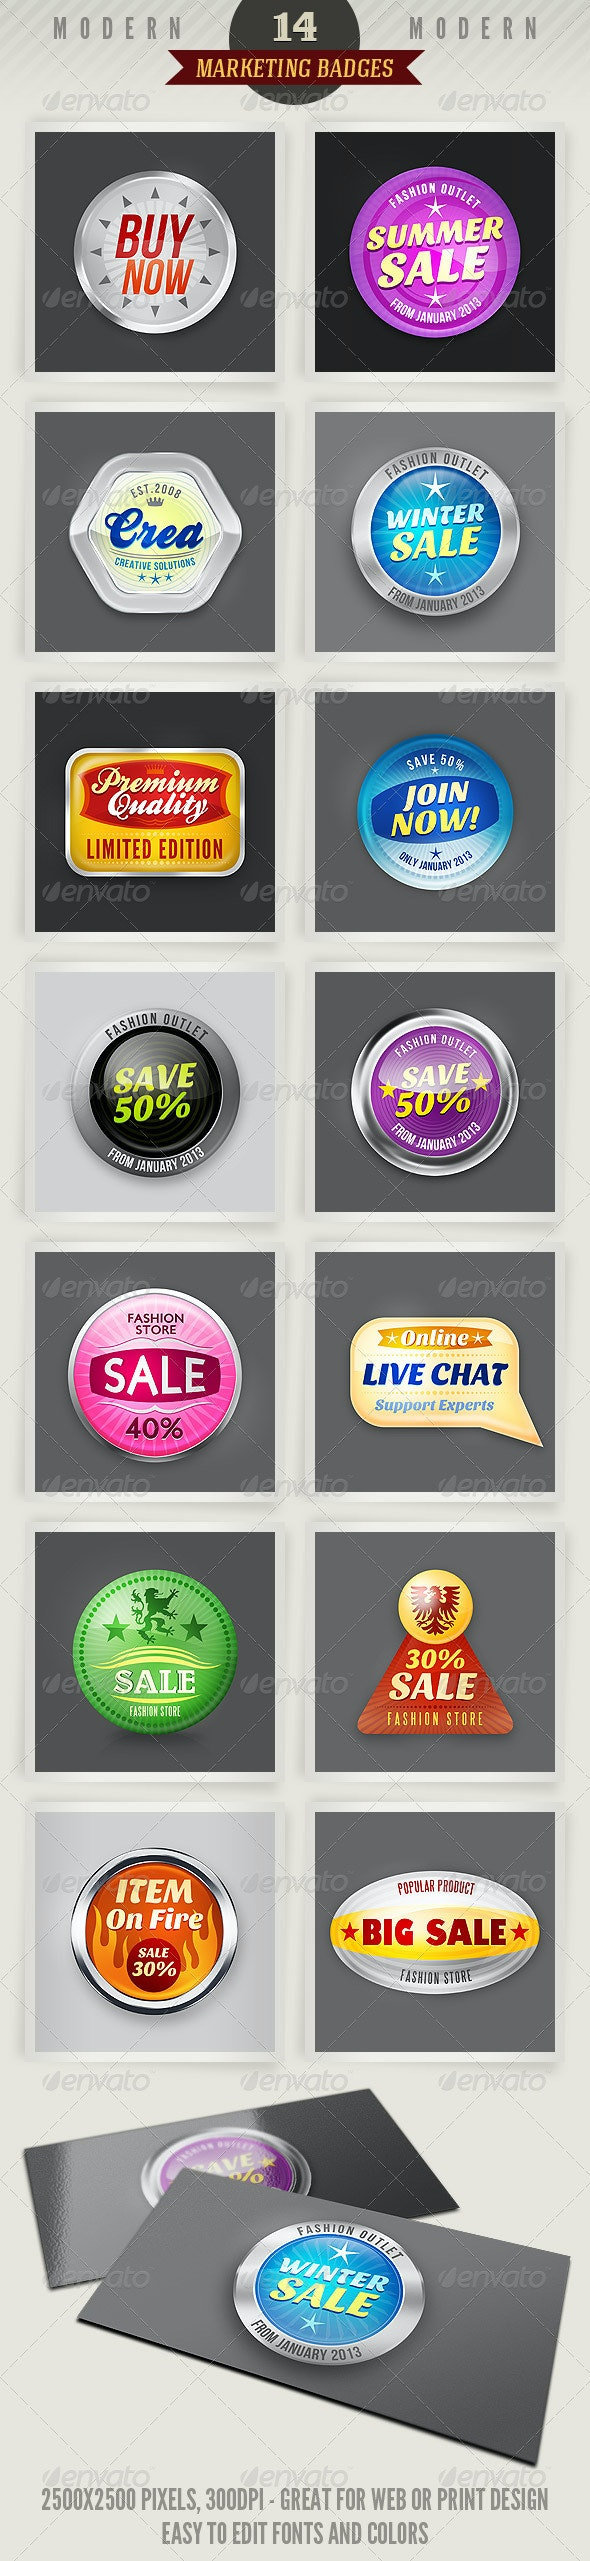 14 Modern Marketing Badges - Badges & Stickers Web Elements